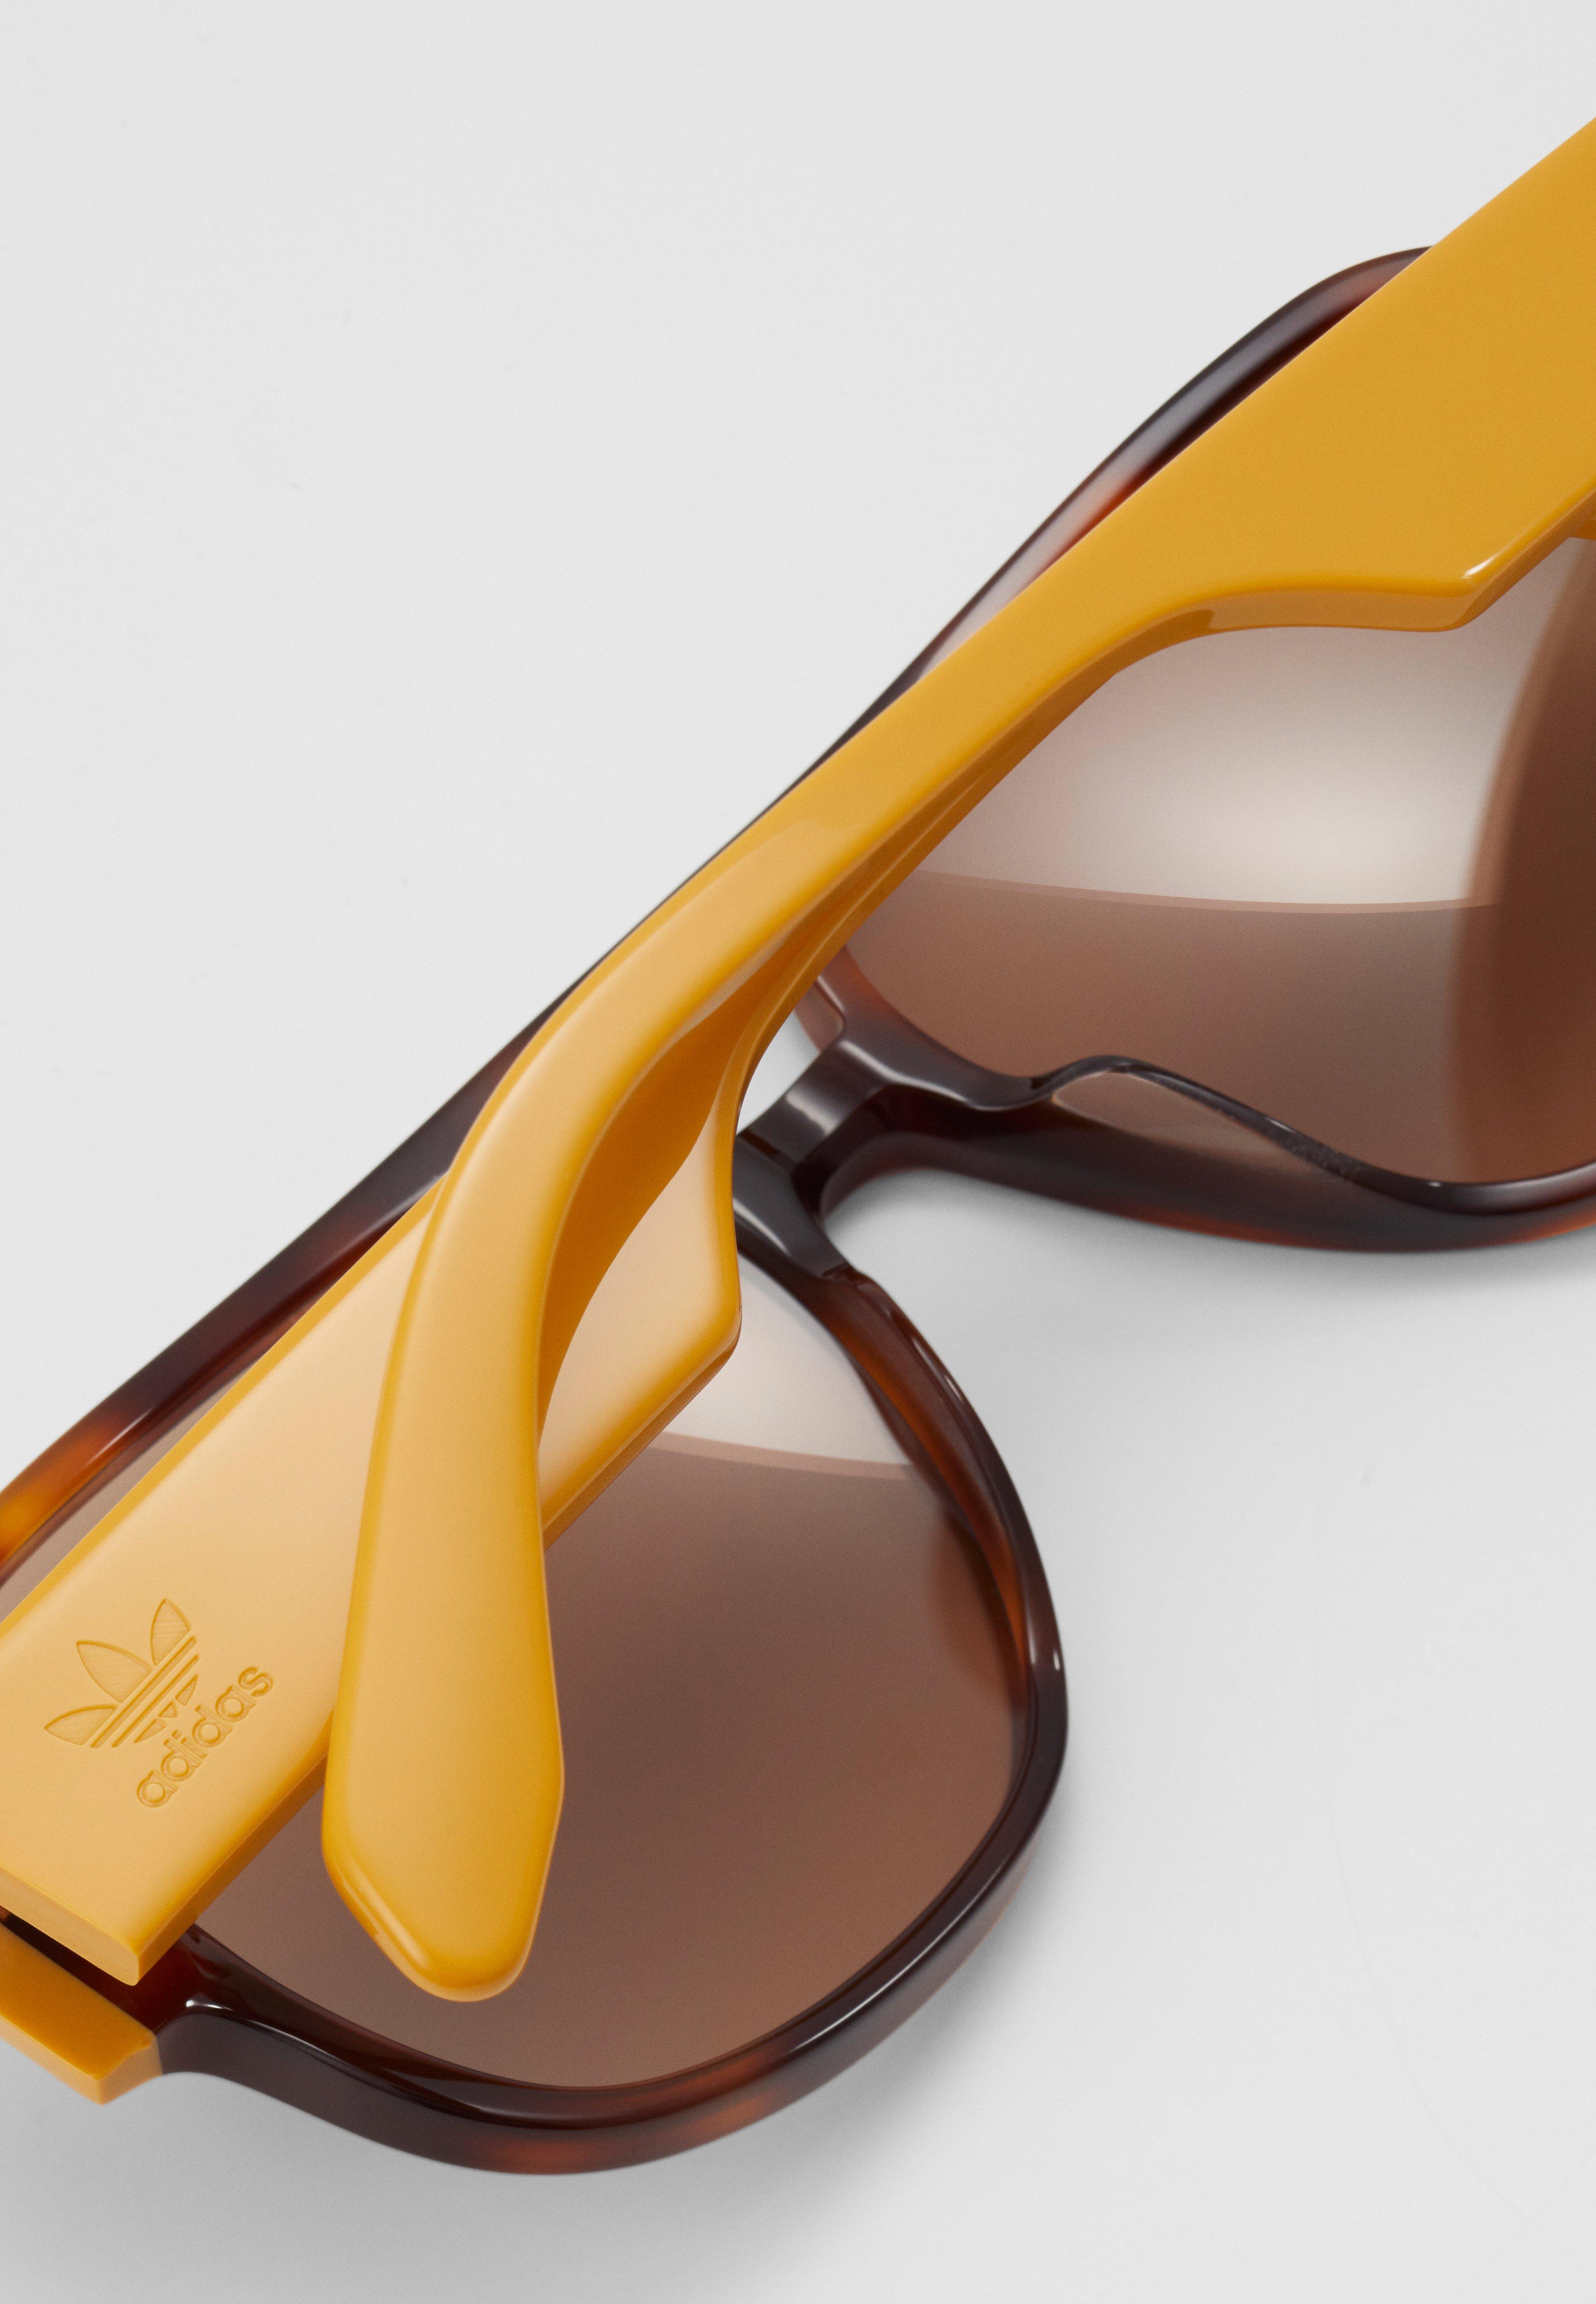 Purchase Cheap Online Shopping Accessories adidas Originals Sunglasses dark havana PxhJufLxQ owXSvOGF8